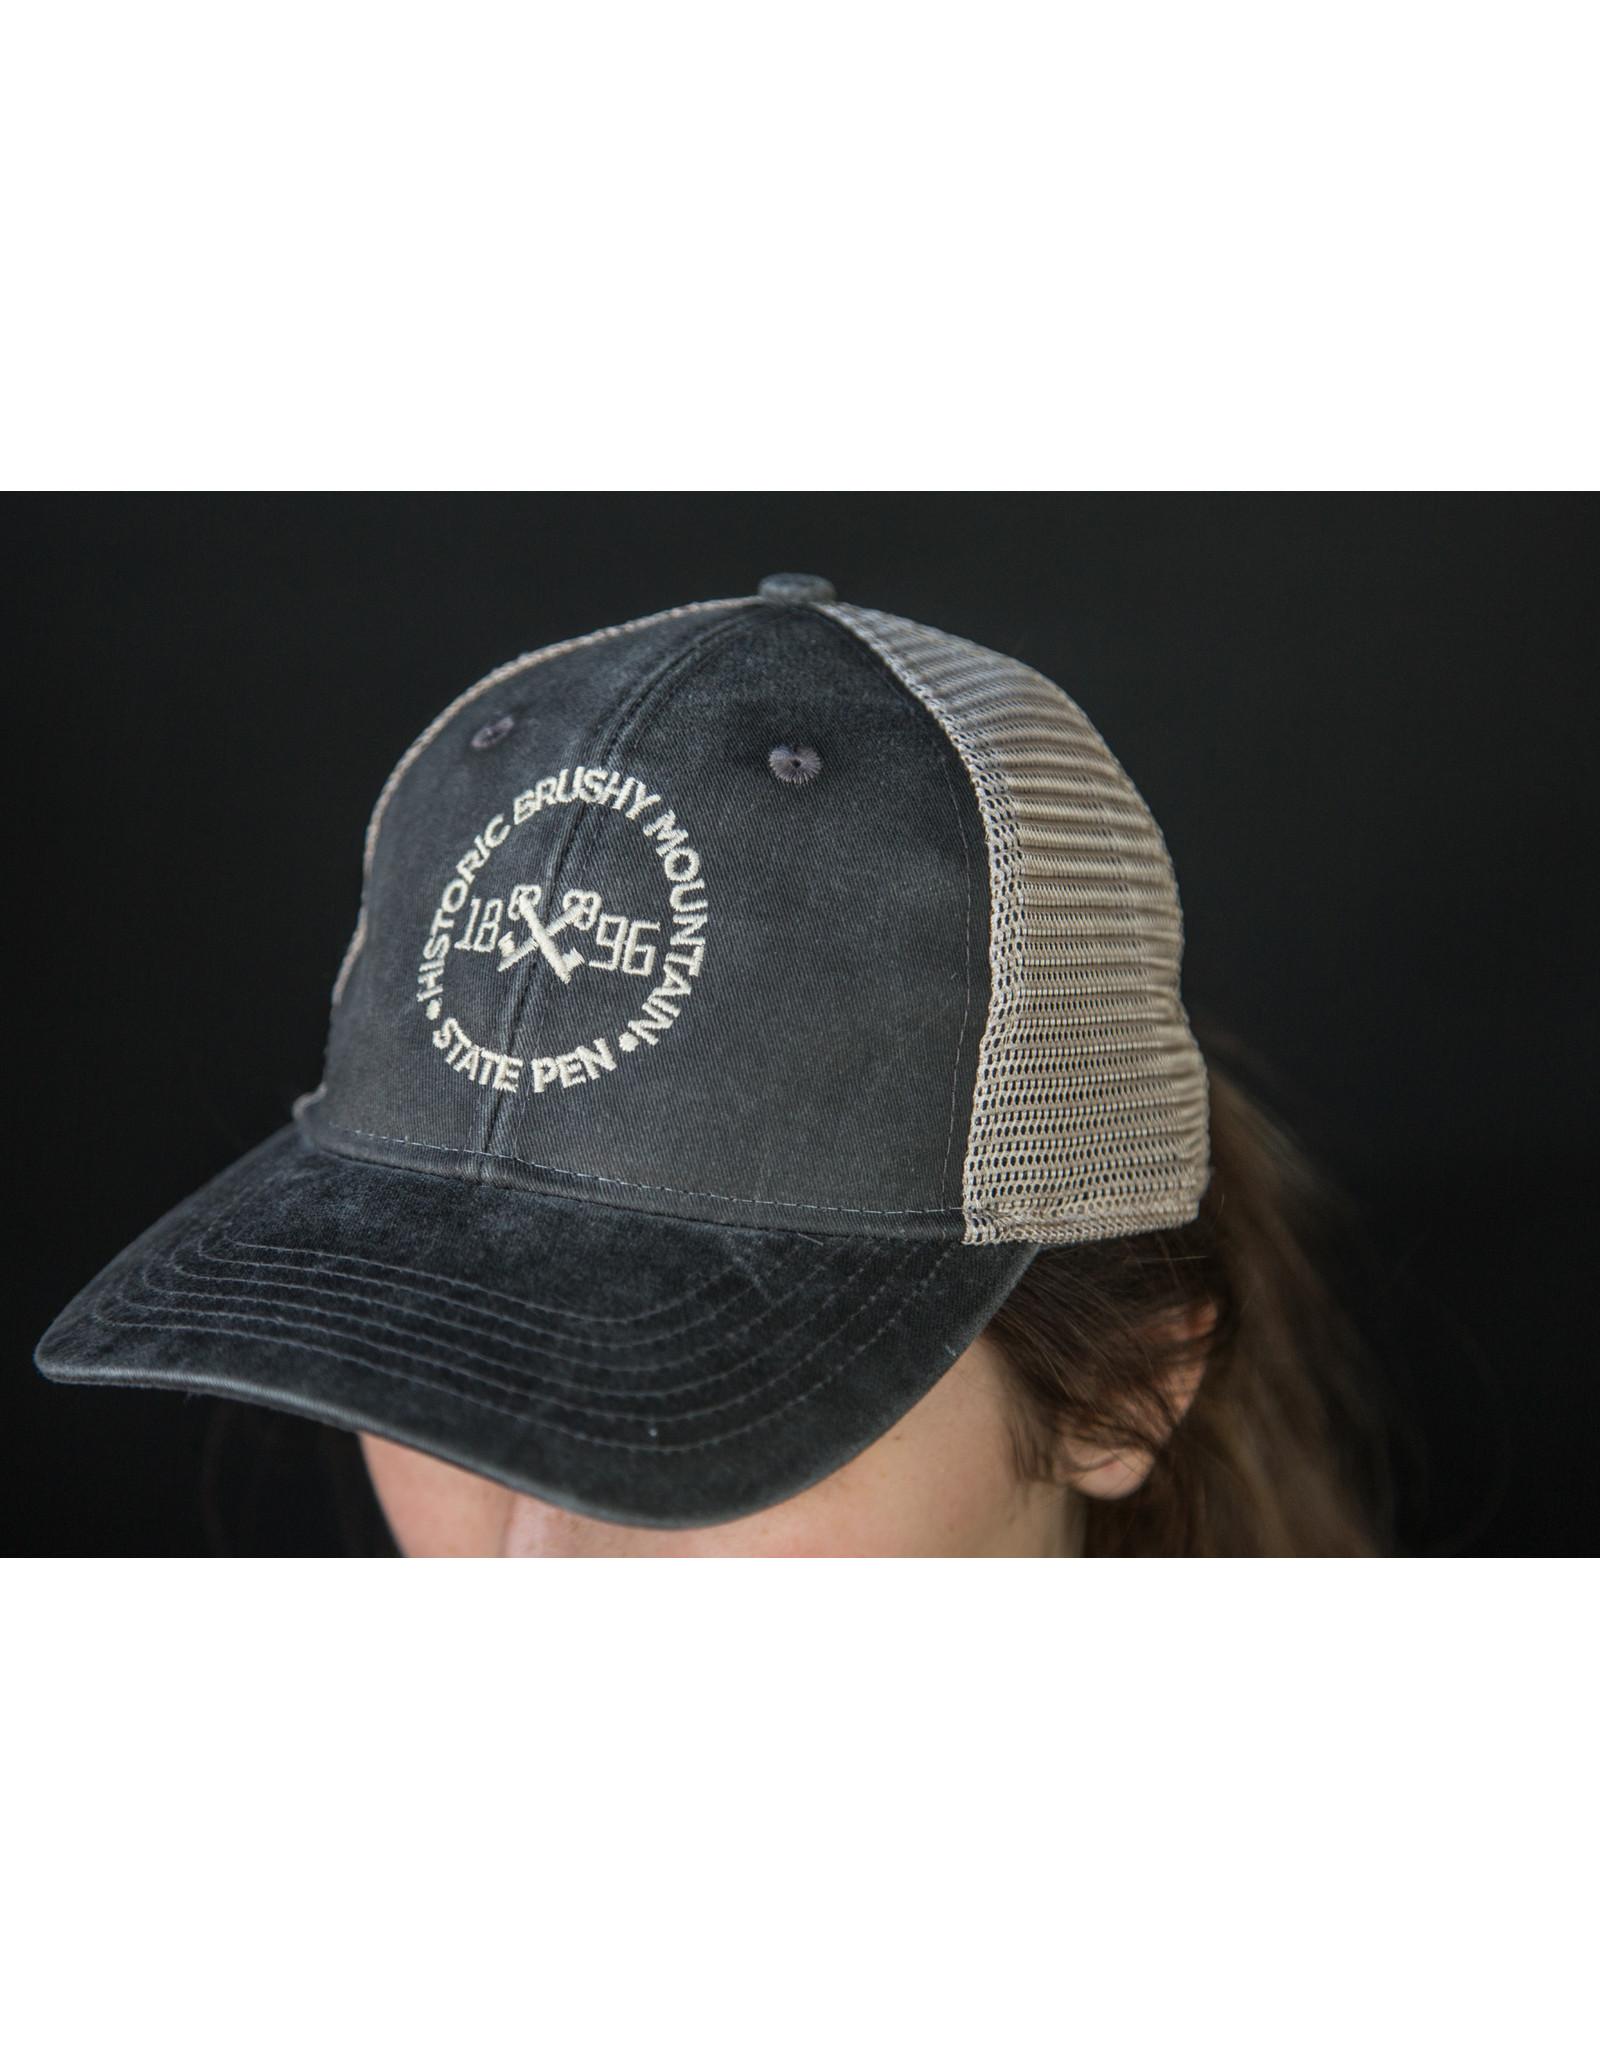 Outdoor Cap Pony Caps - Key Logo - Black/Tea Stain